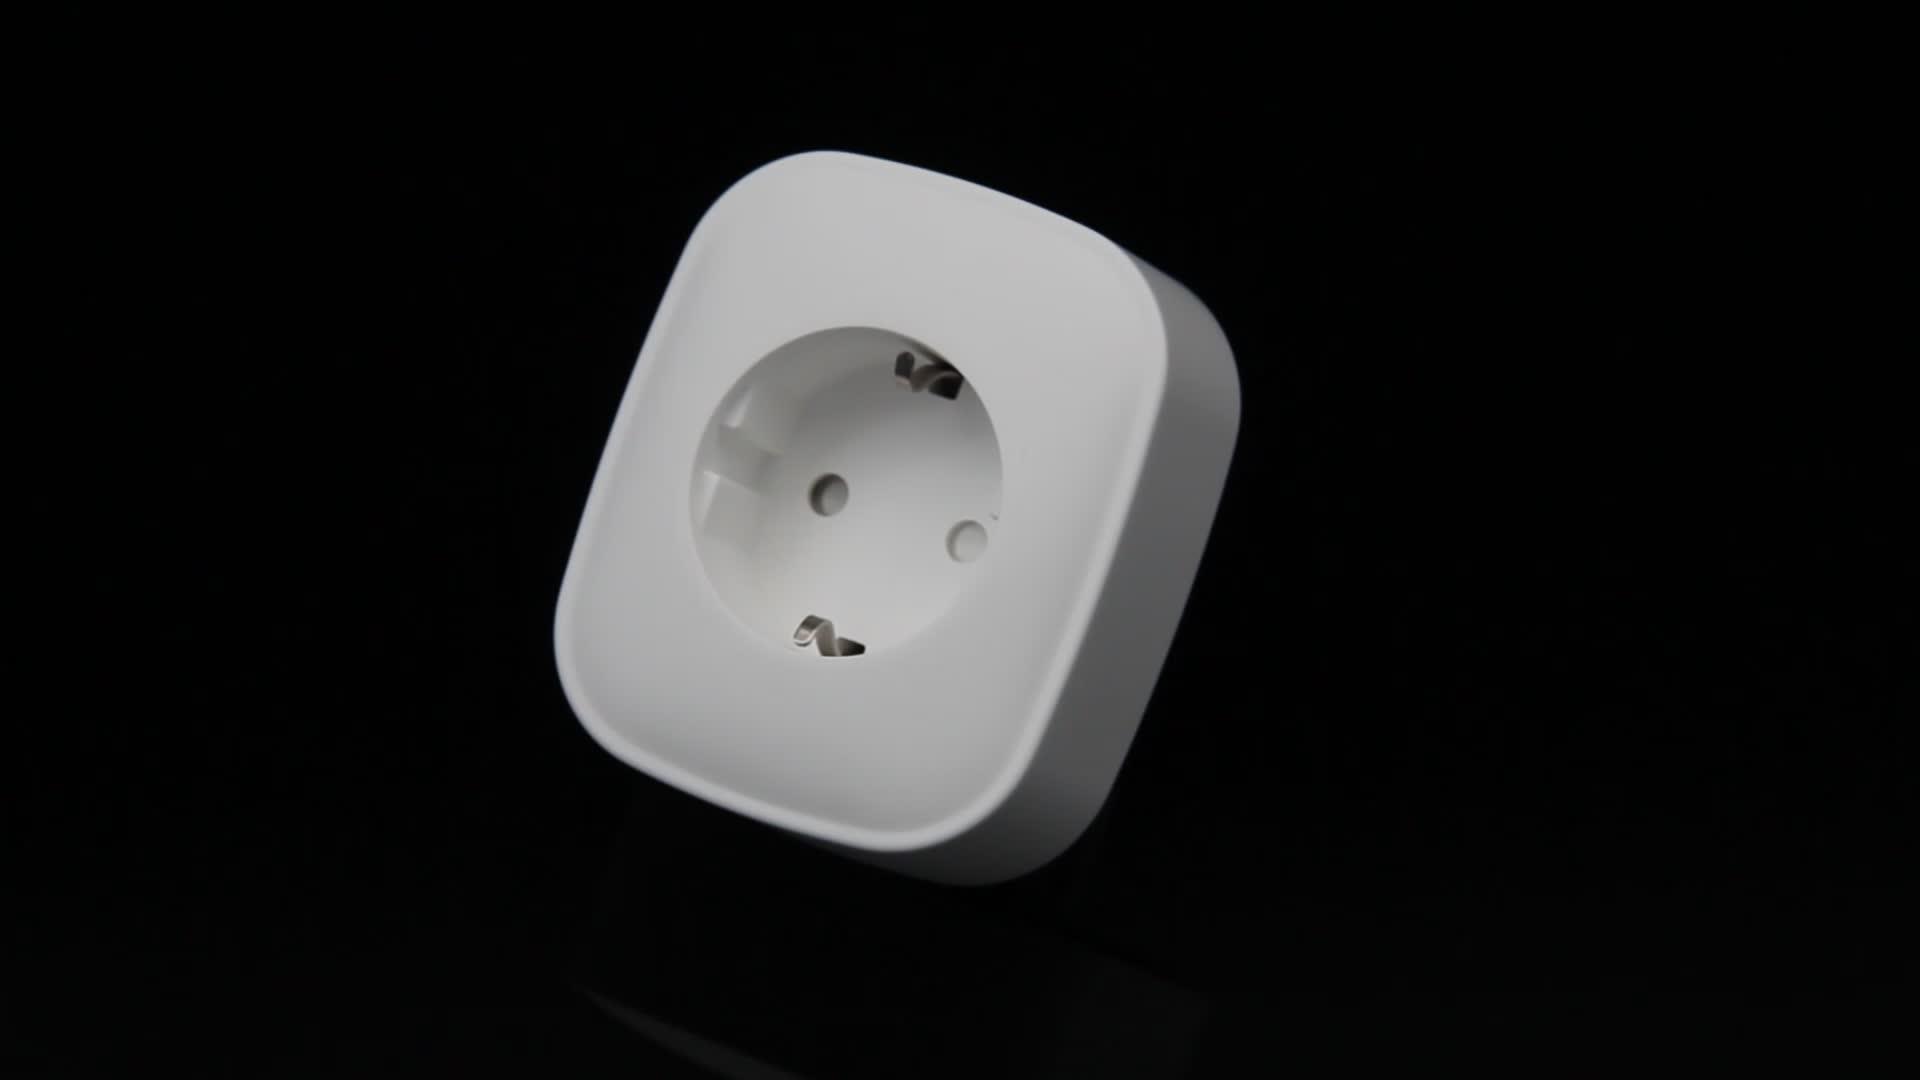 Tuya WiFi inteligente Socket wireless smart plug compatible con Alexa y google